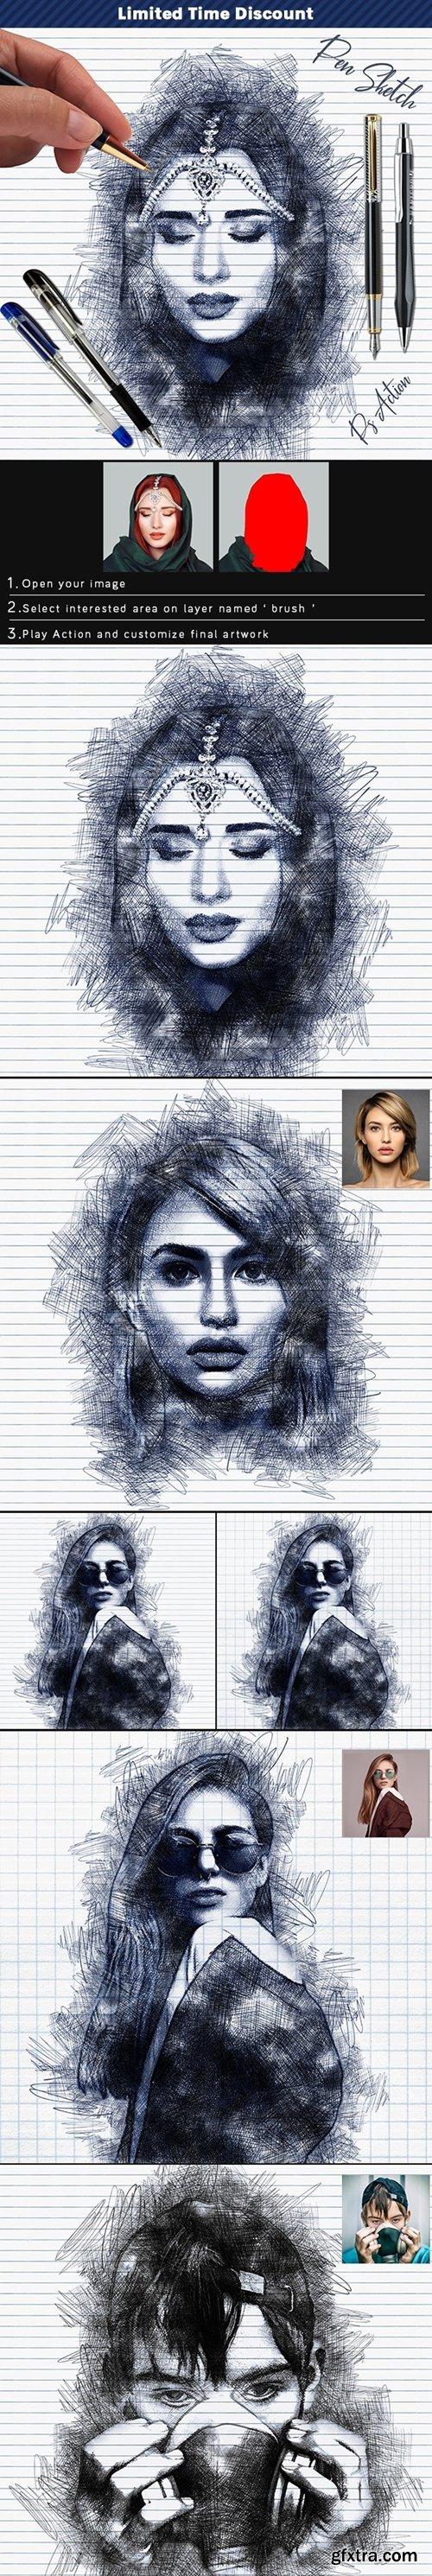 GraphicRiver - Pen Sketch Photoshop Action 25774811